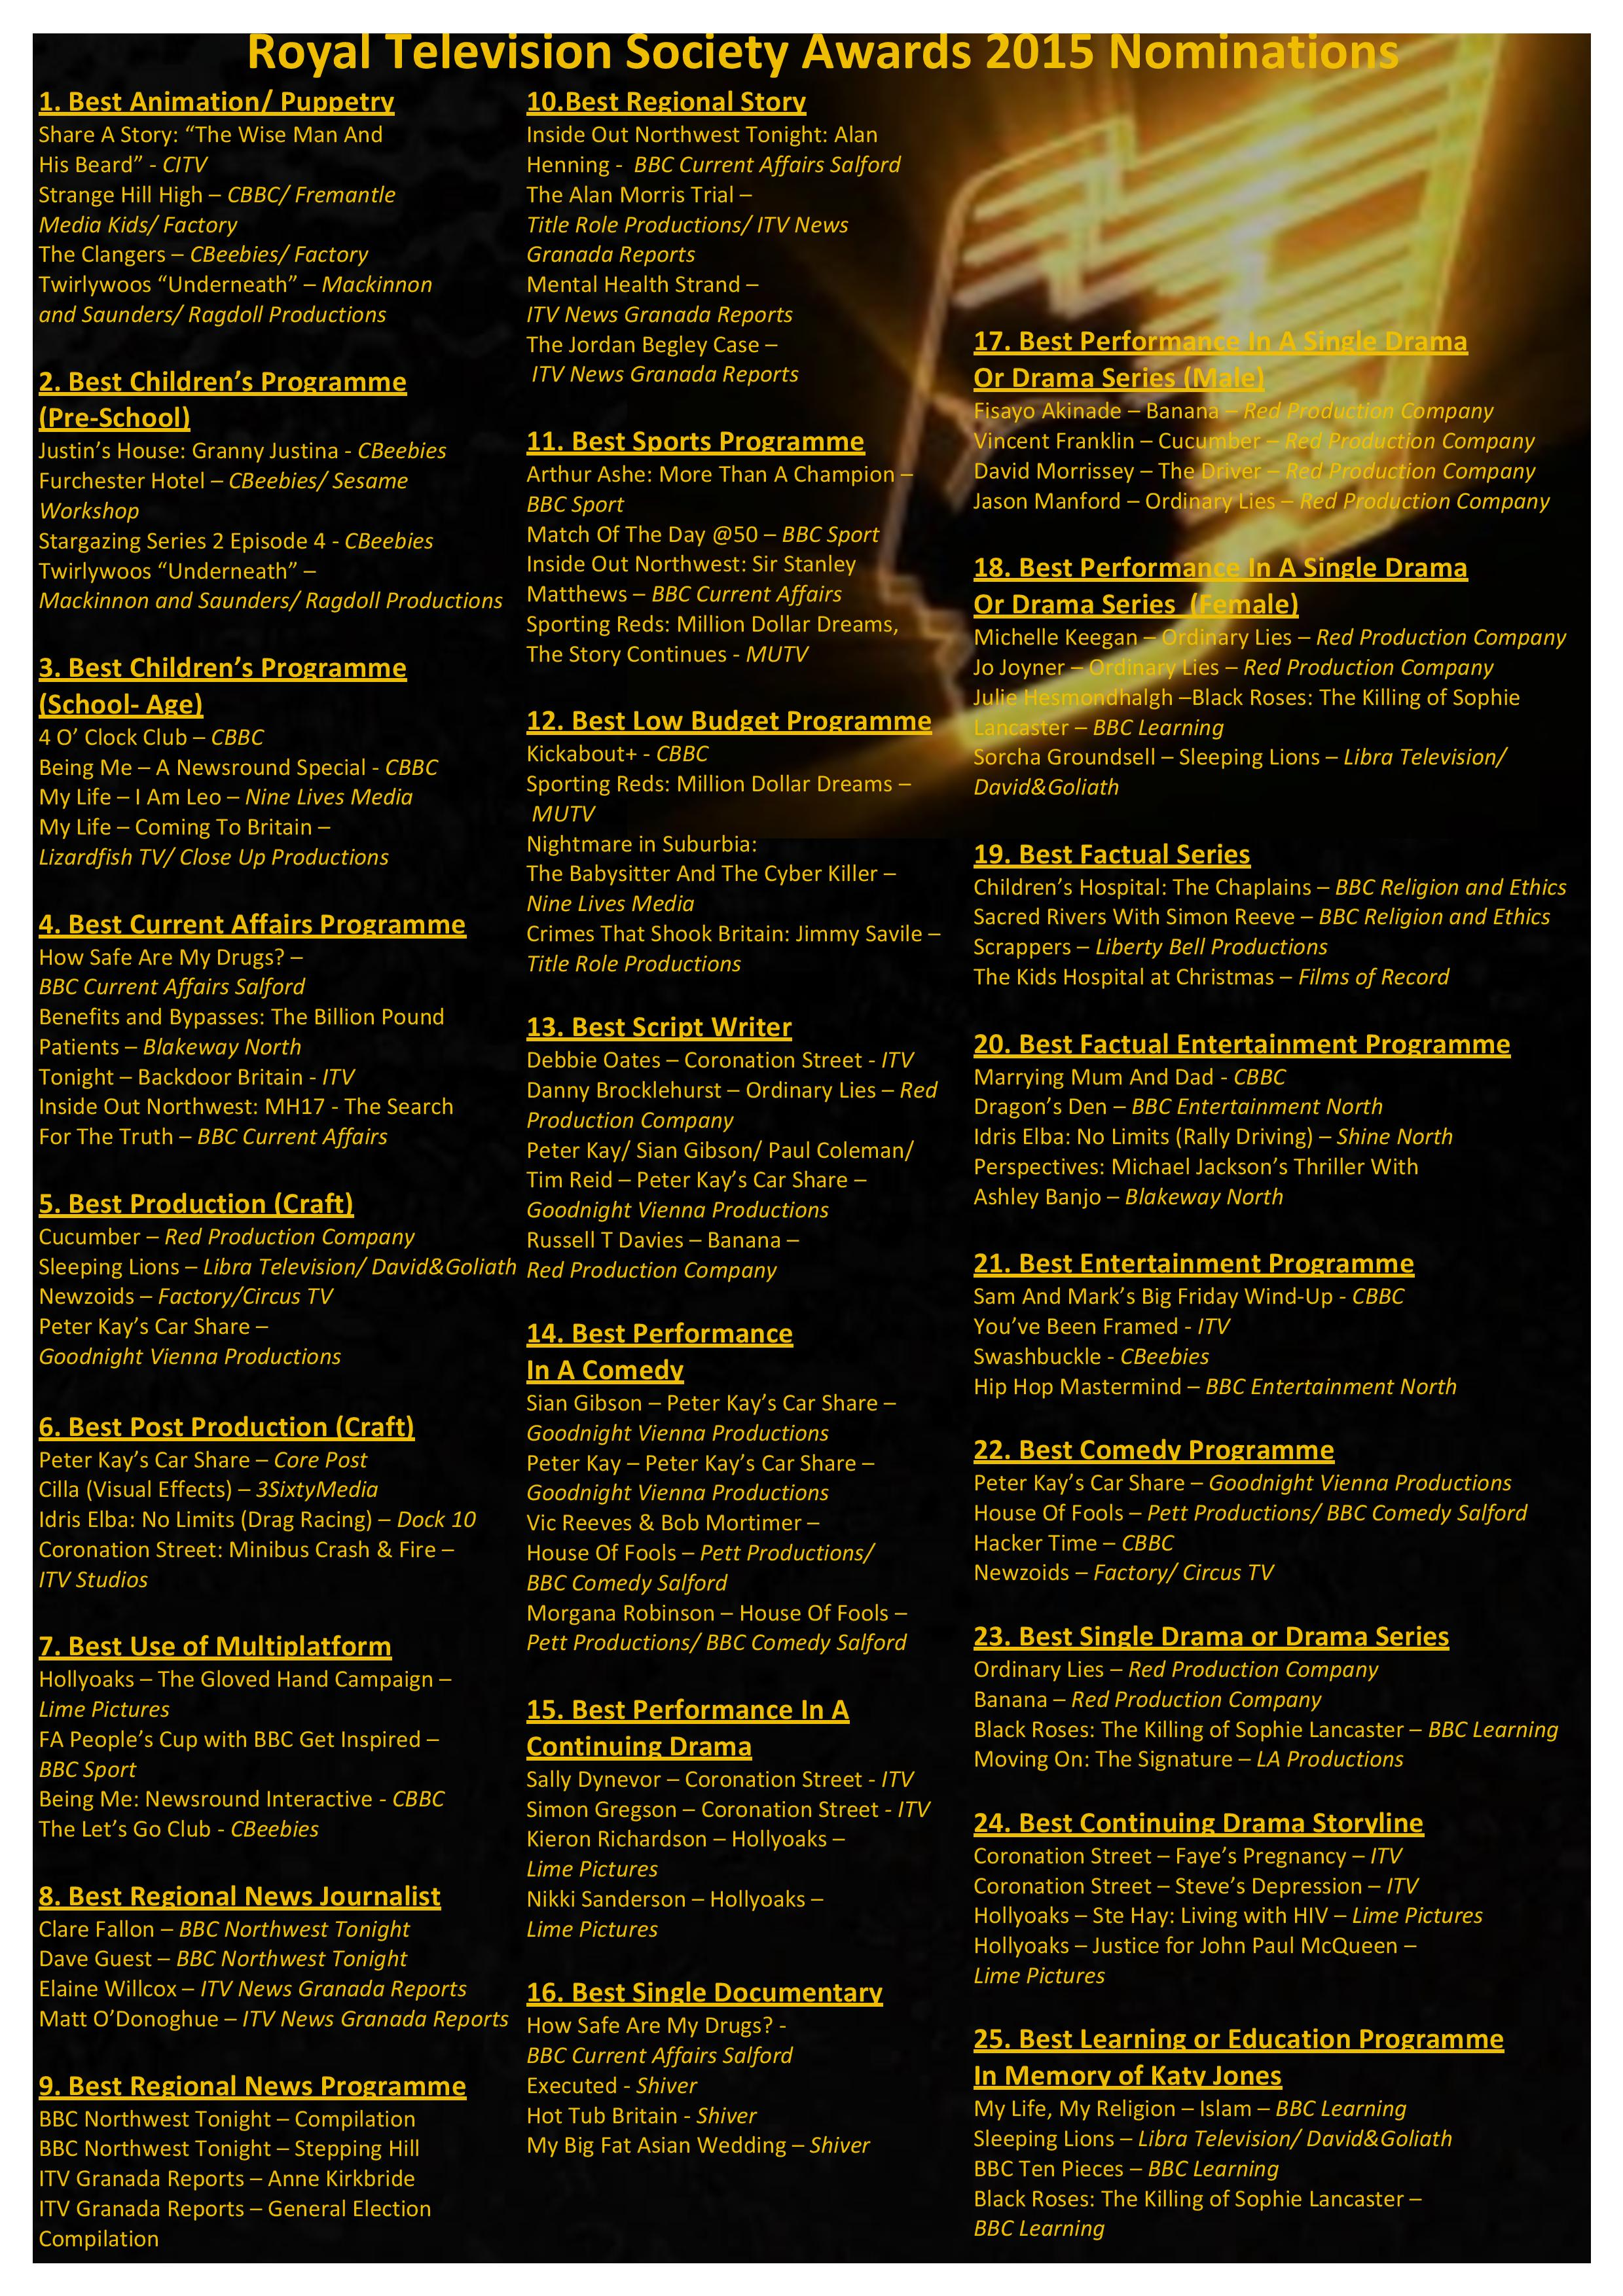 rts_shortlist_2015_-_pdf-page-001-2_0